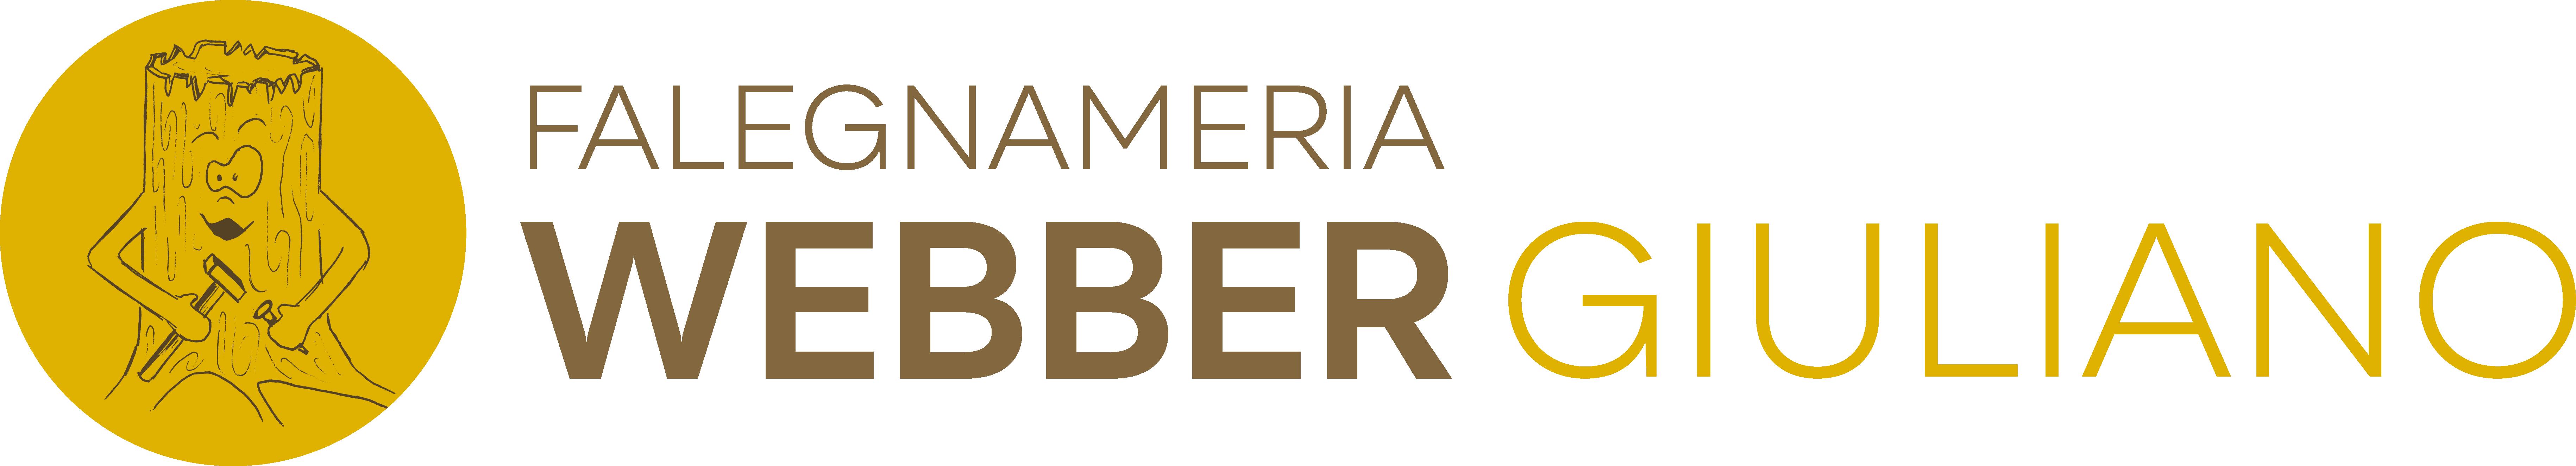 Falegnameria Webber